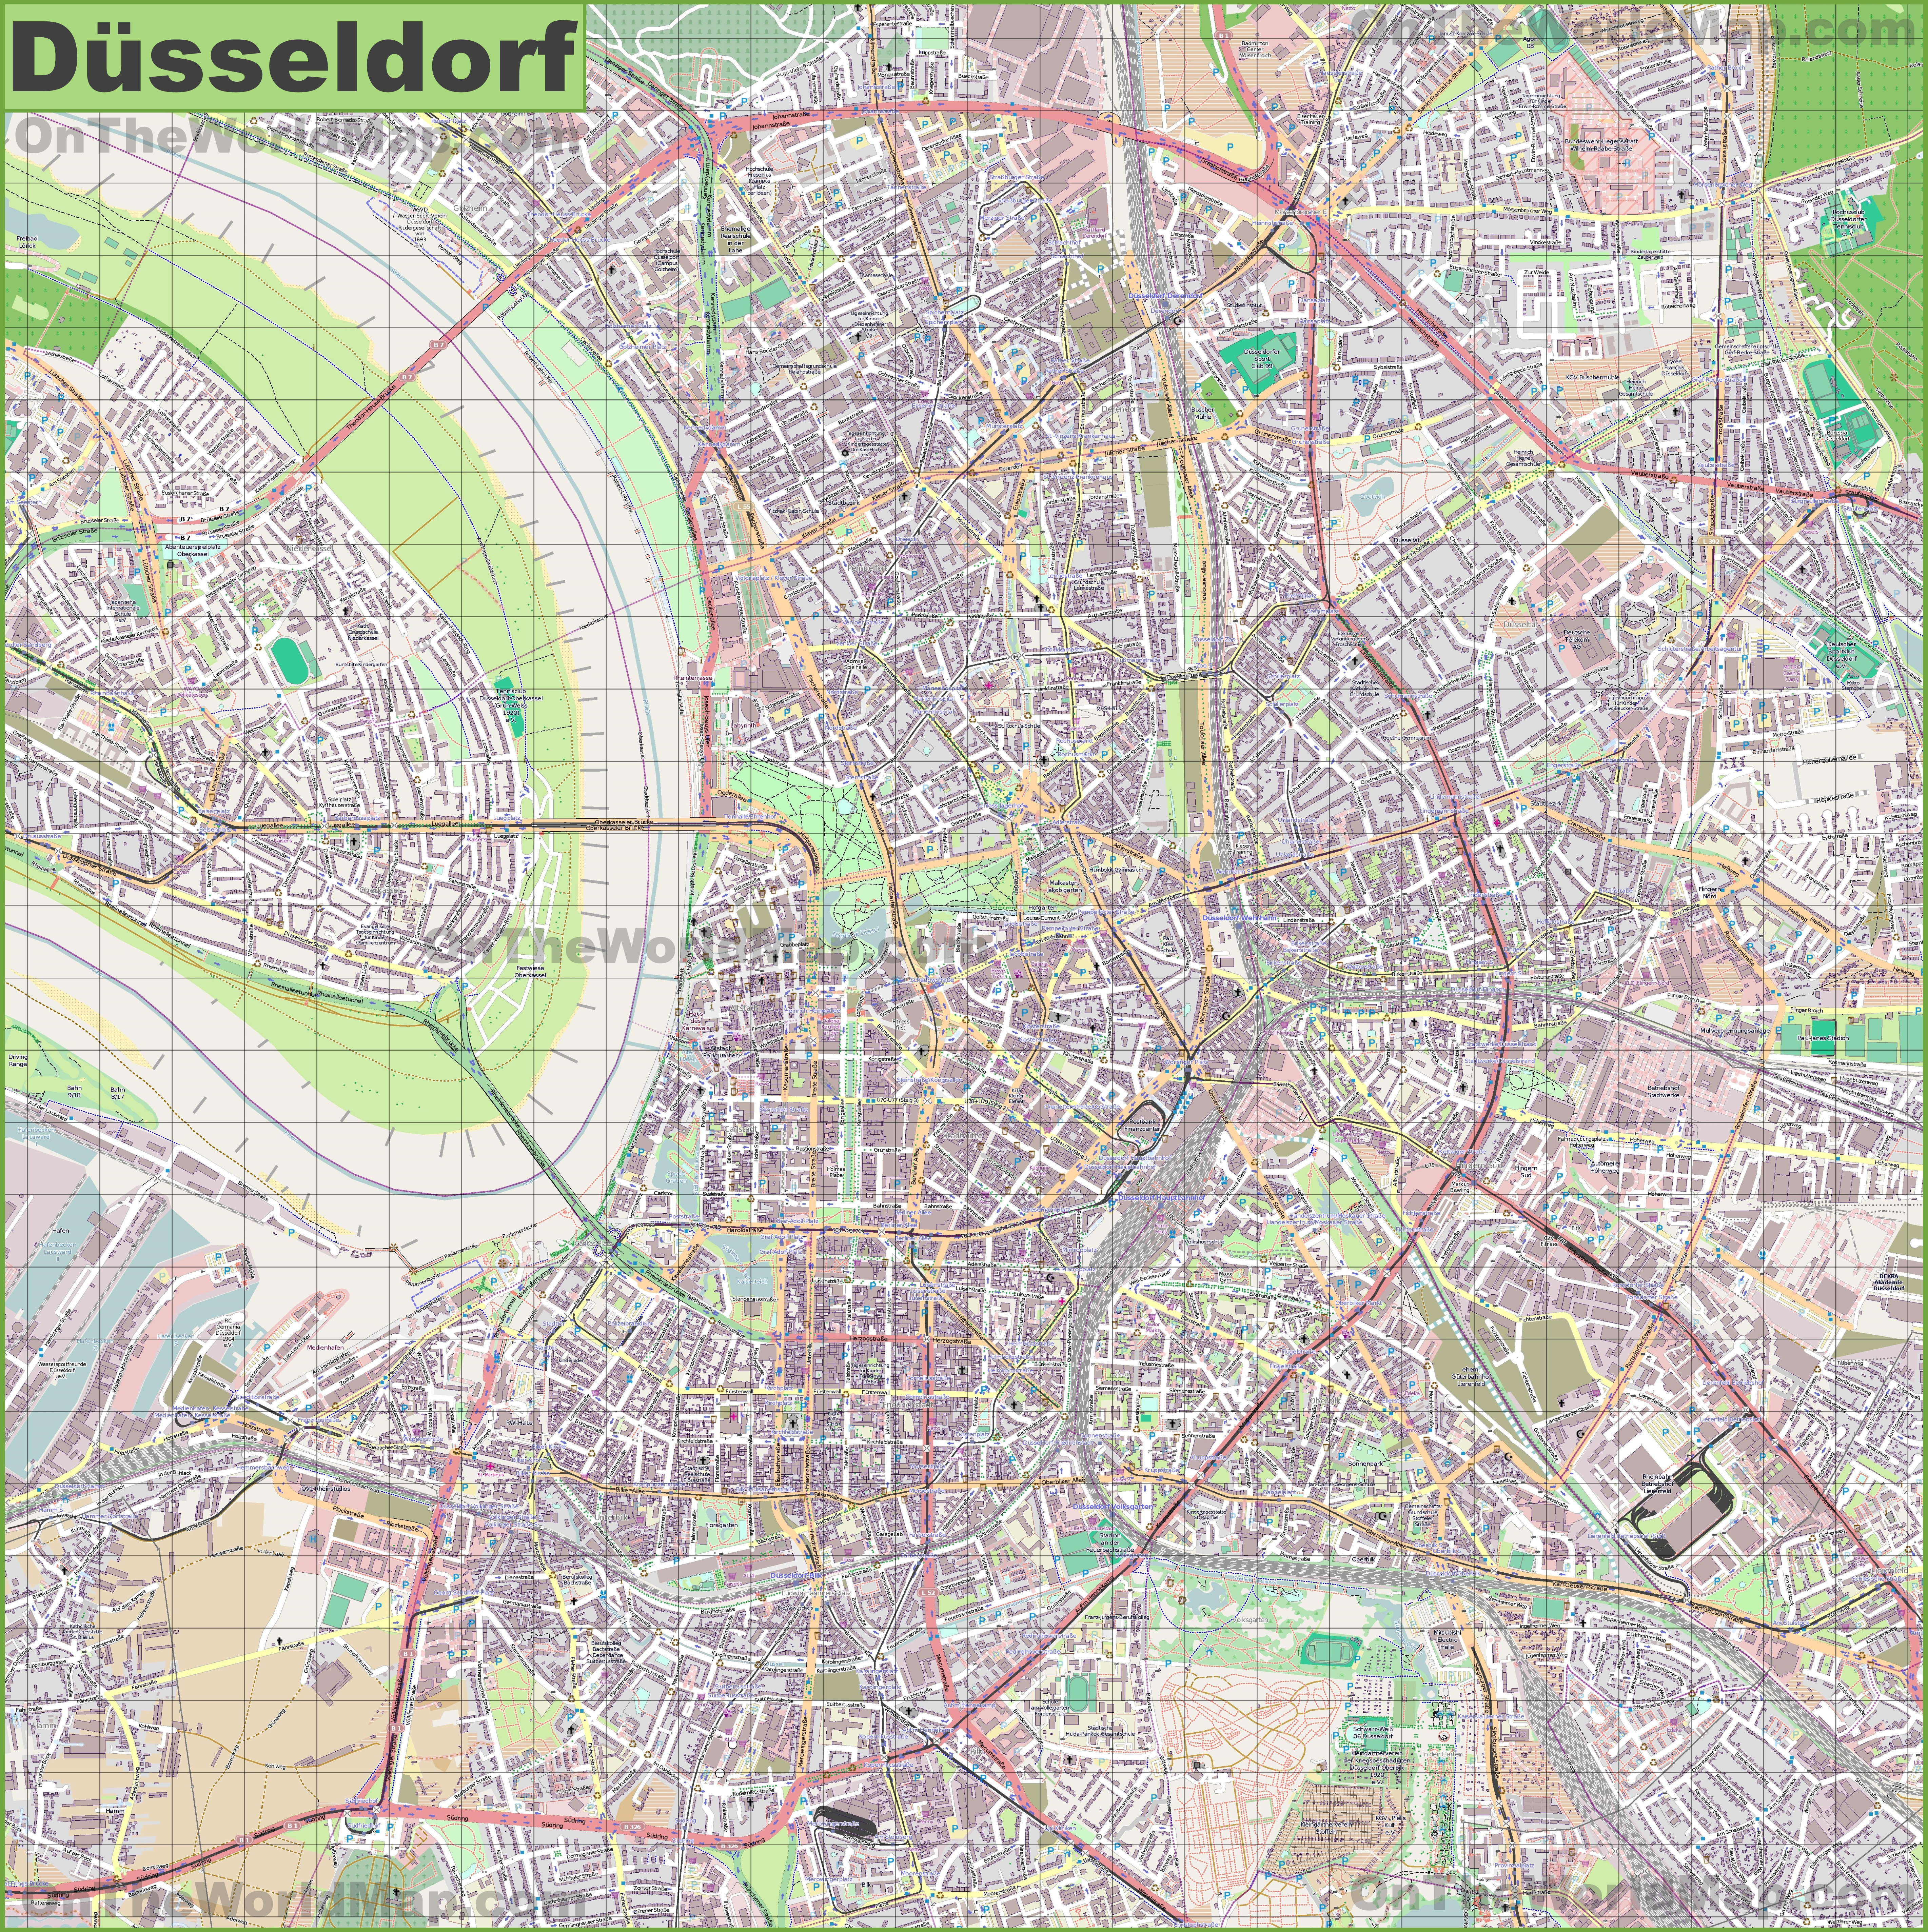 Dsseldorf Maps Germany Maps of Dsseldorf